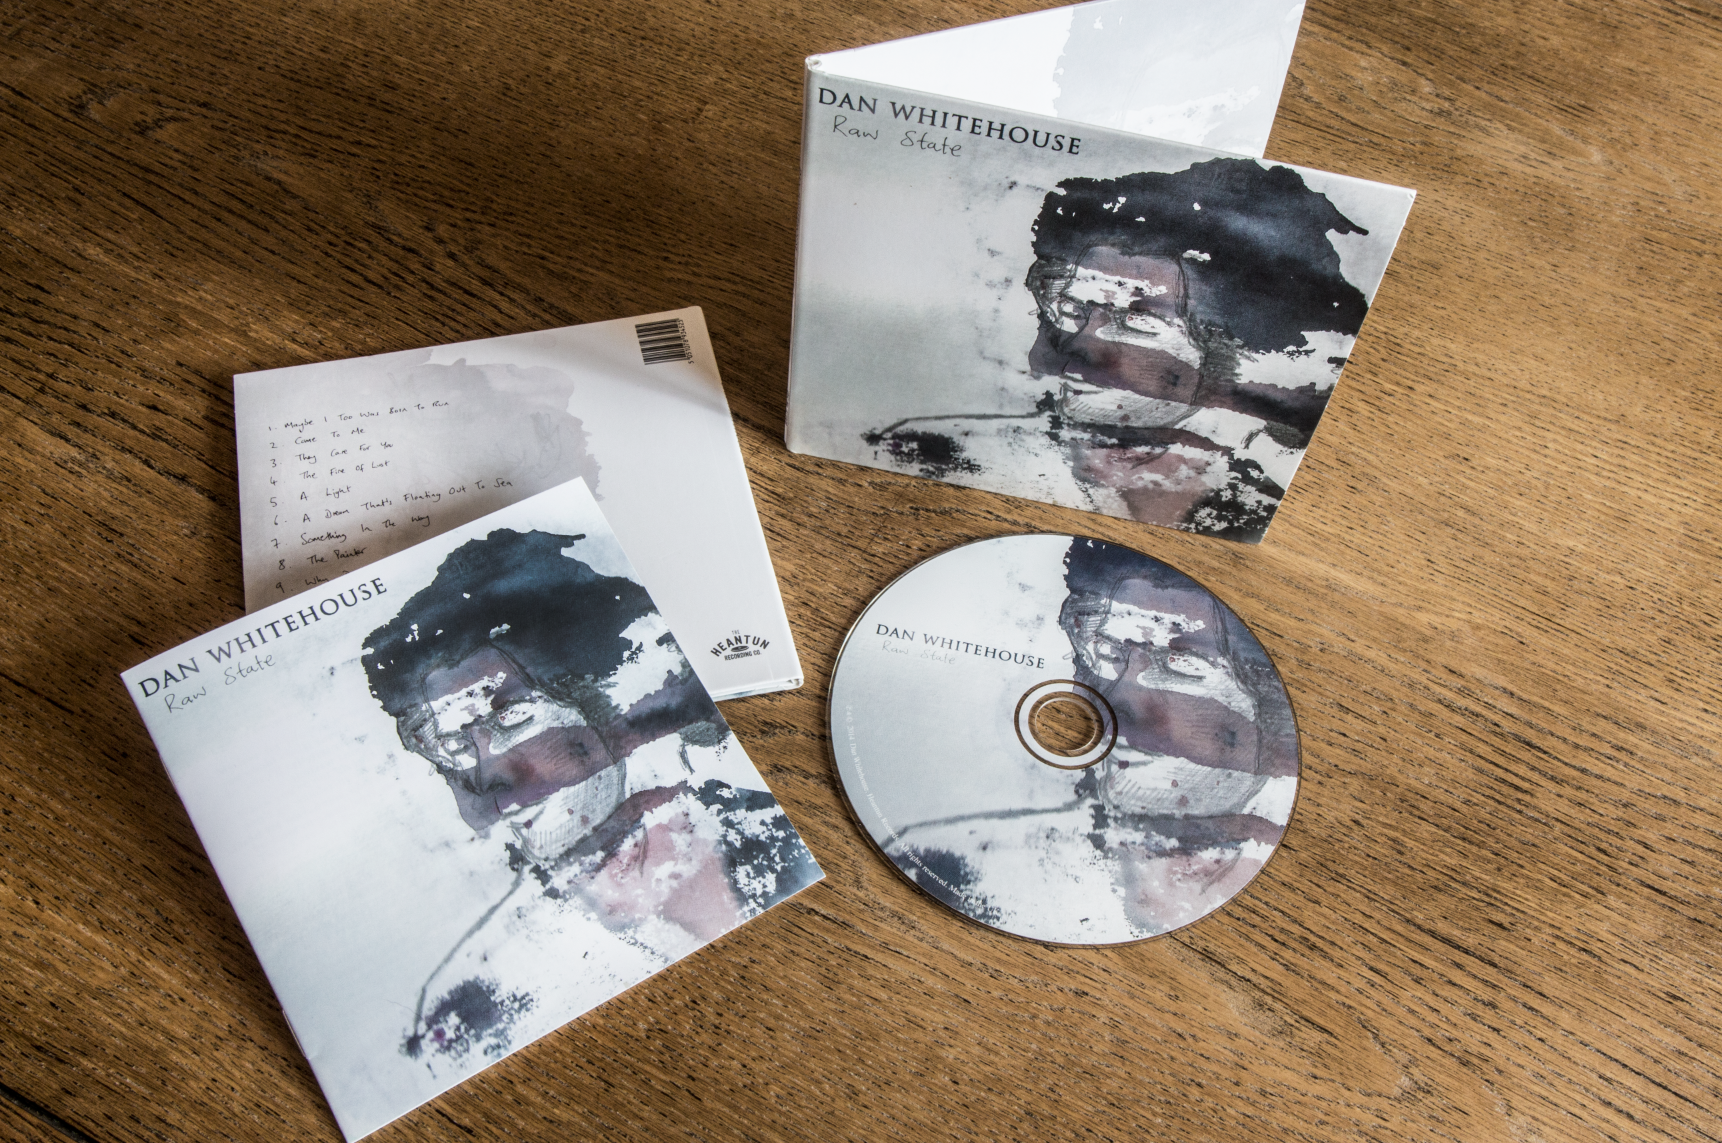 Heantun Recording Co. - Dan Whitehouse